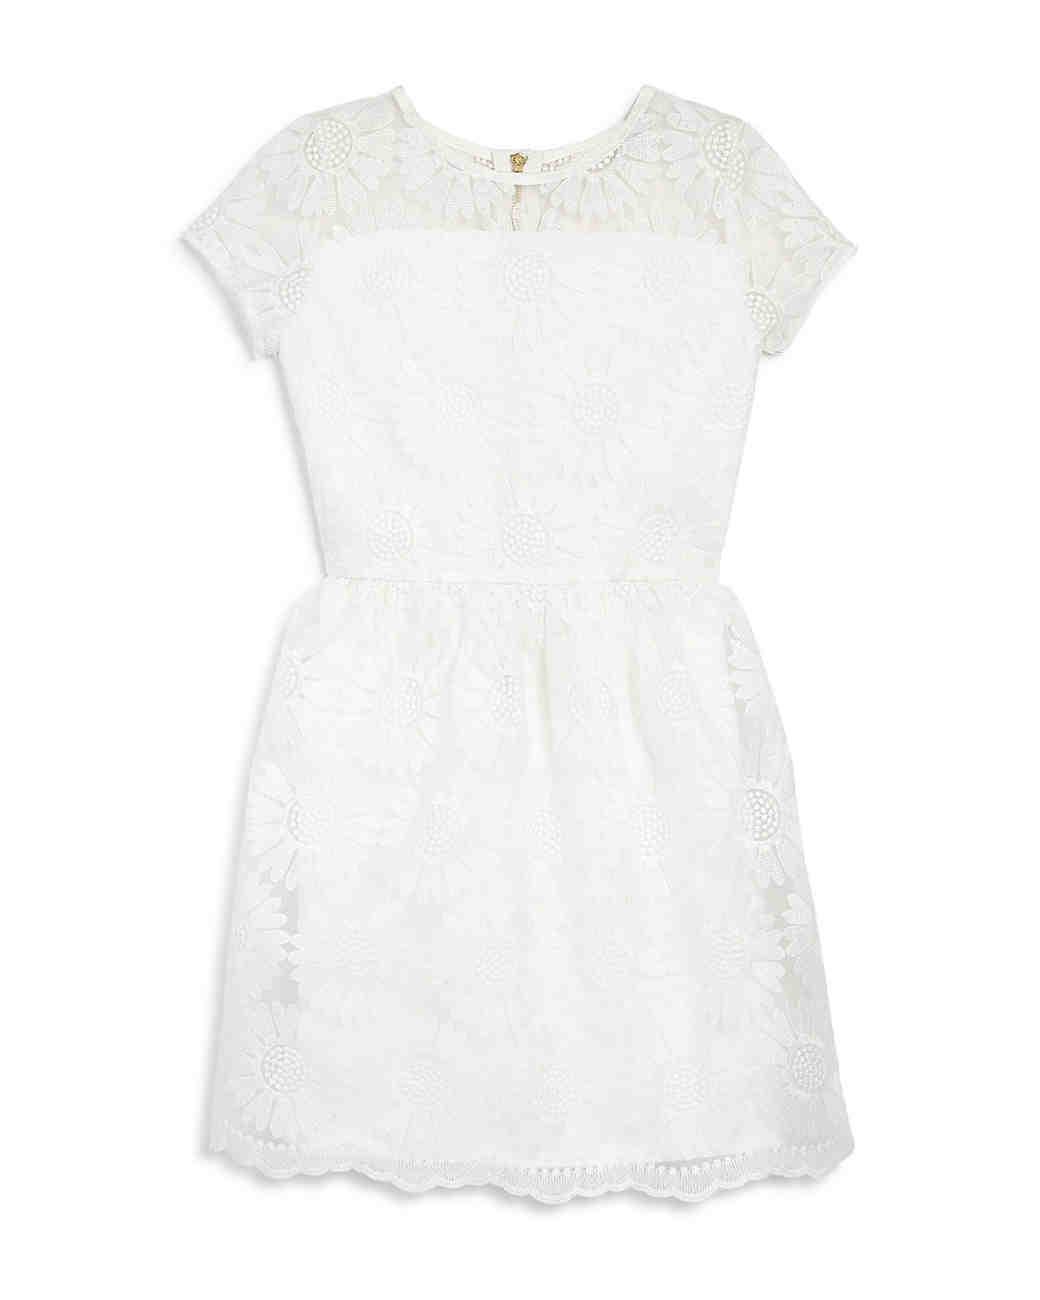 summer flower girl dress white lace illusion neckline